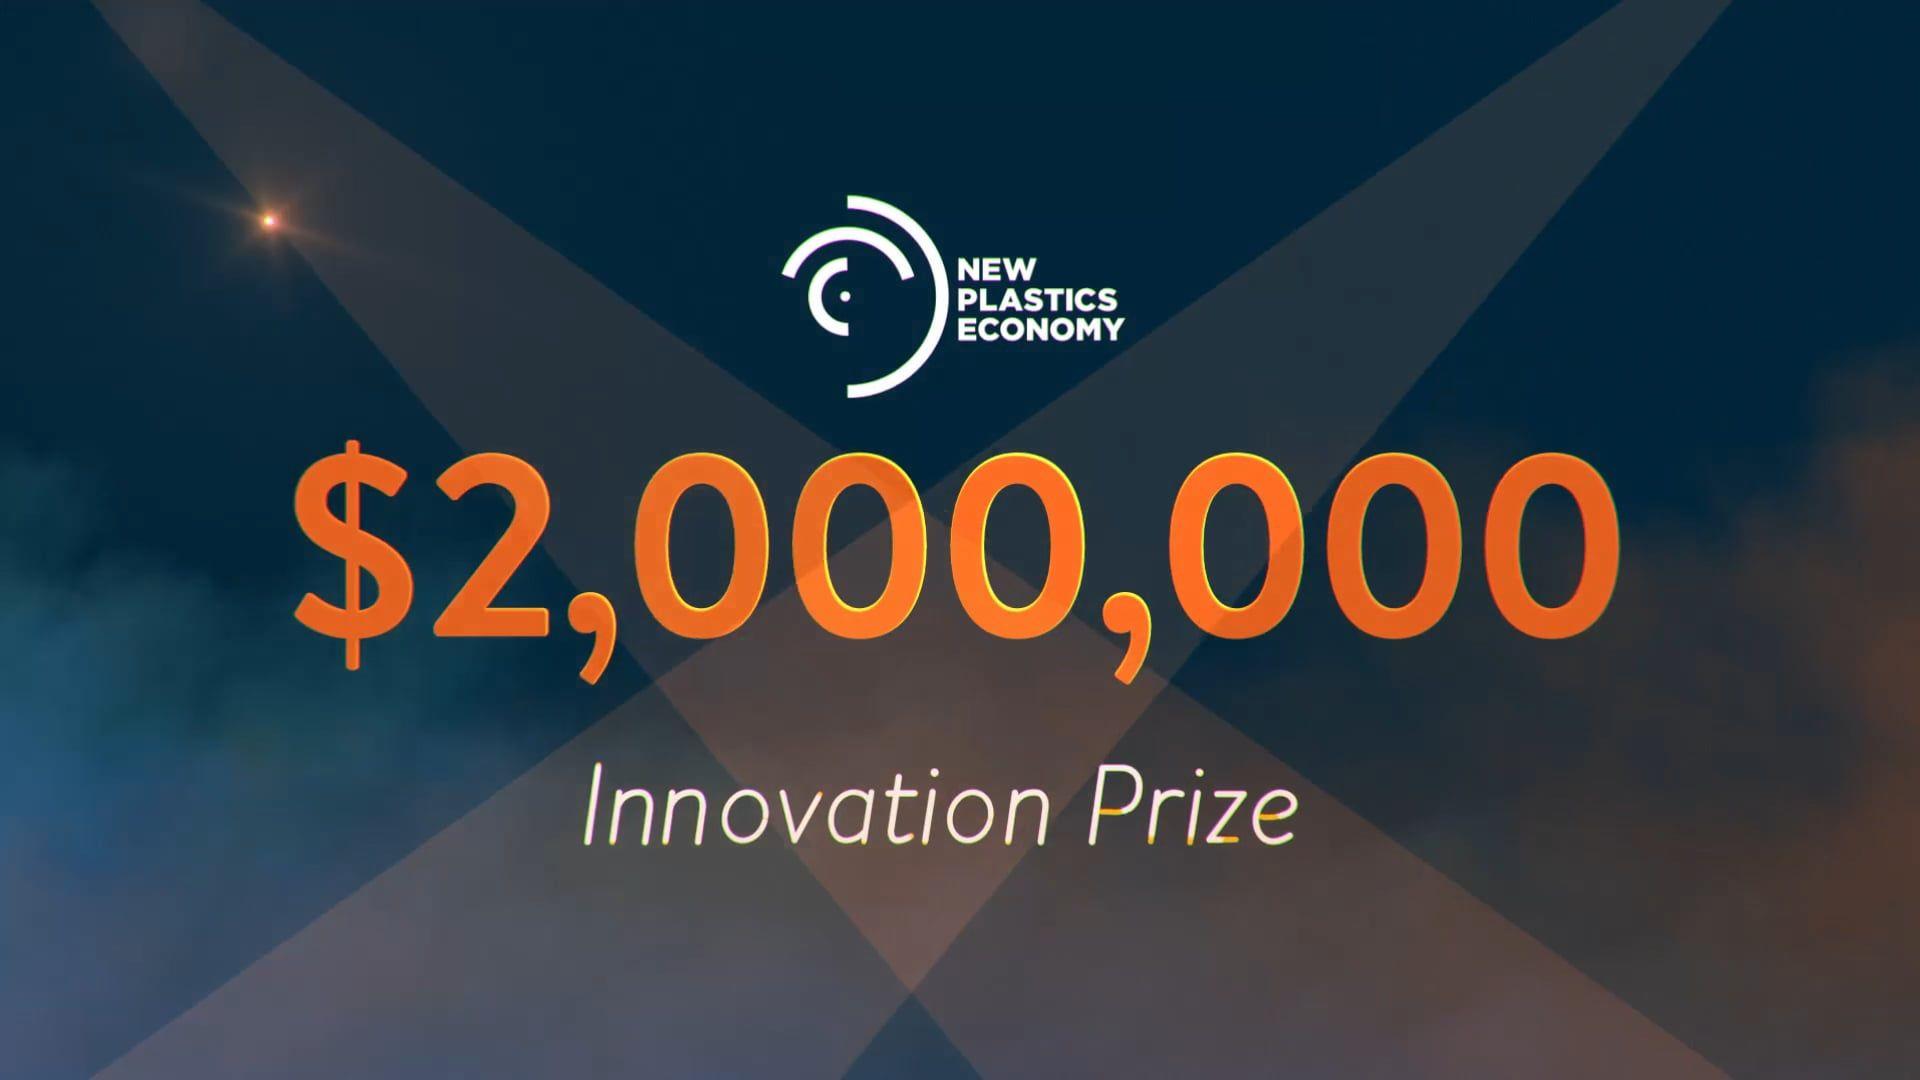 New plastics economy innovation prize sustainability projects 6d7b573bae906009273ffedba94f2ed9g altavistaventures Choice Image